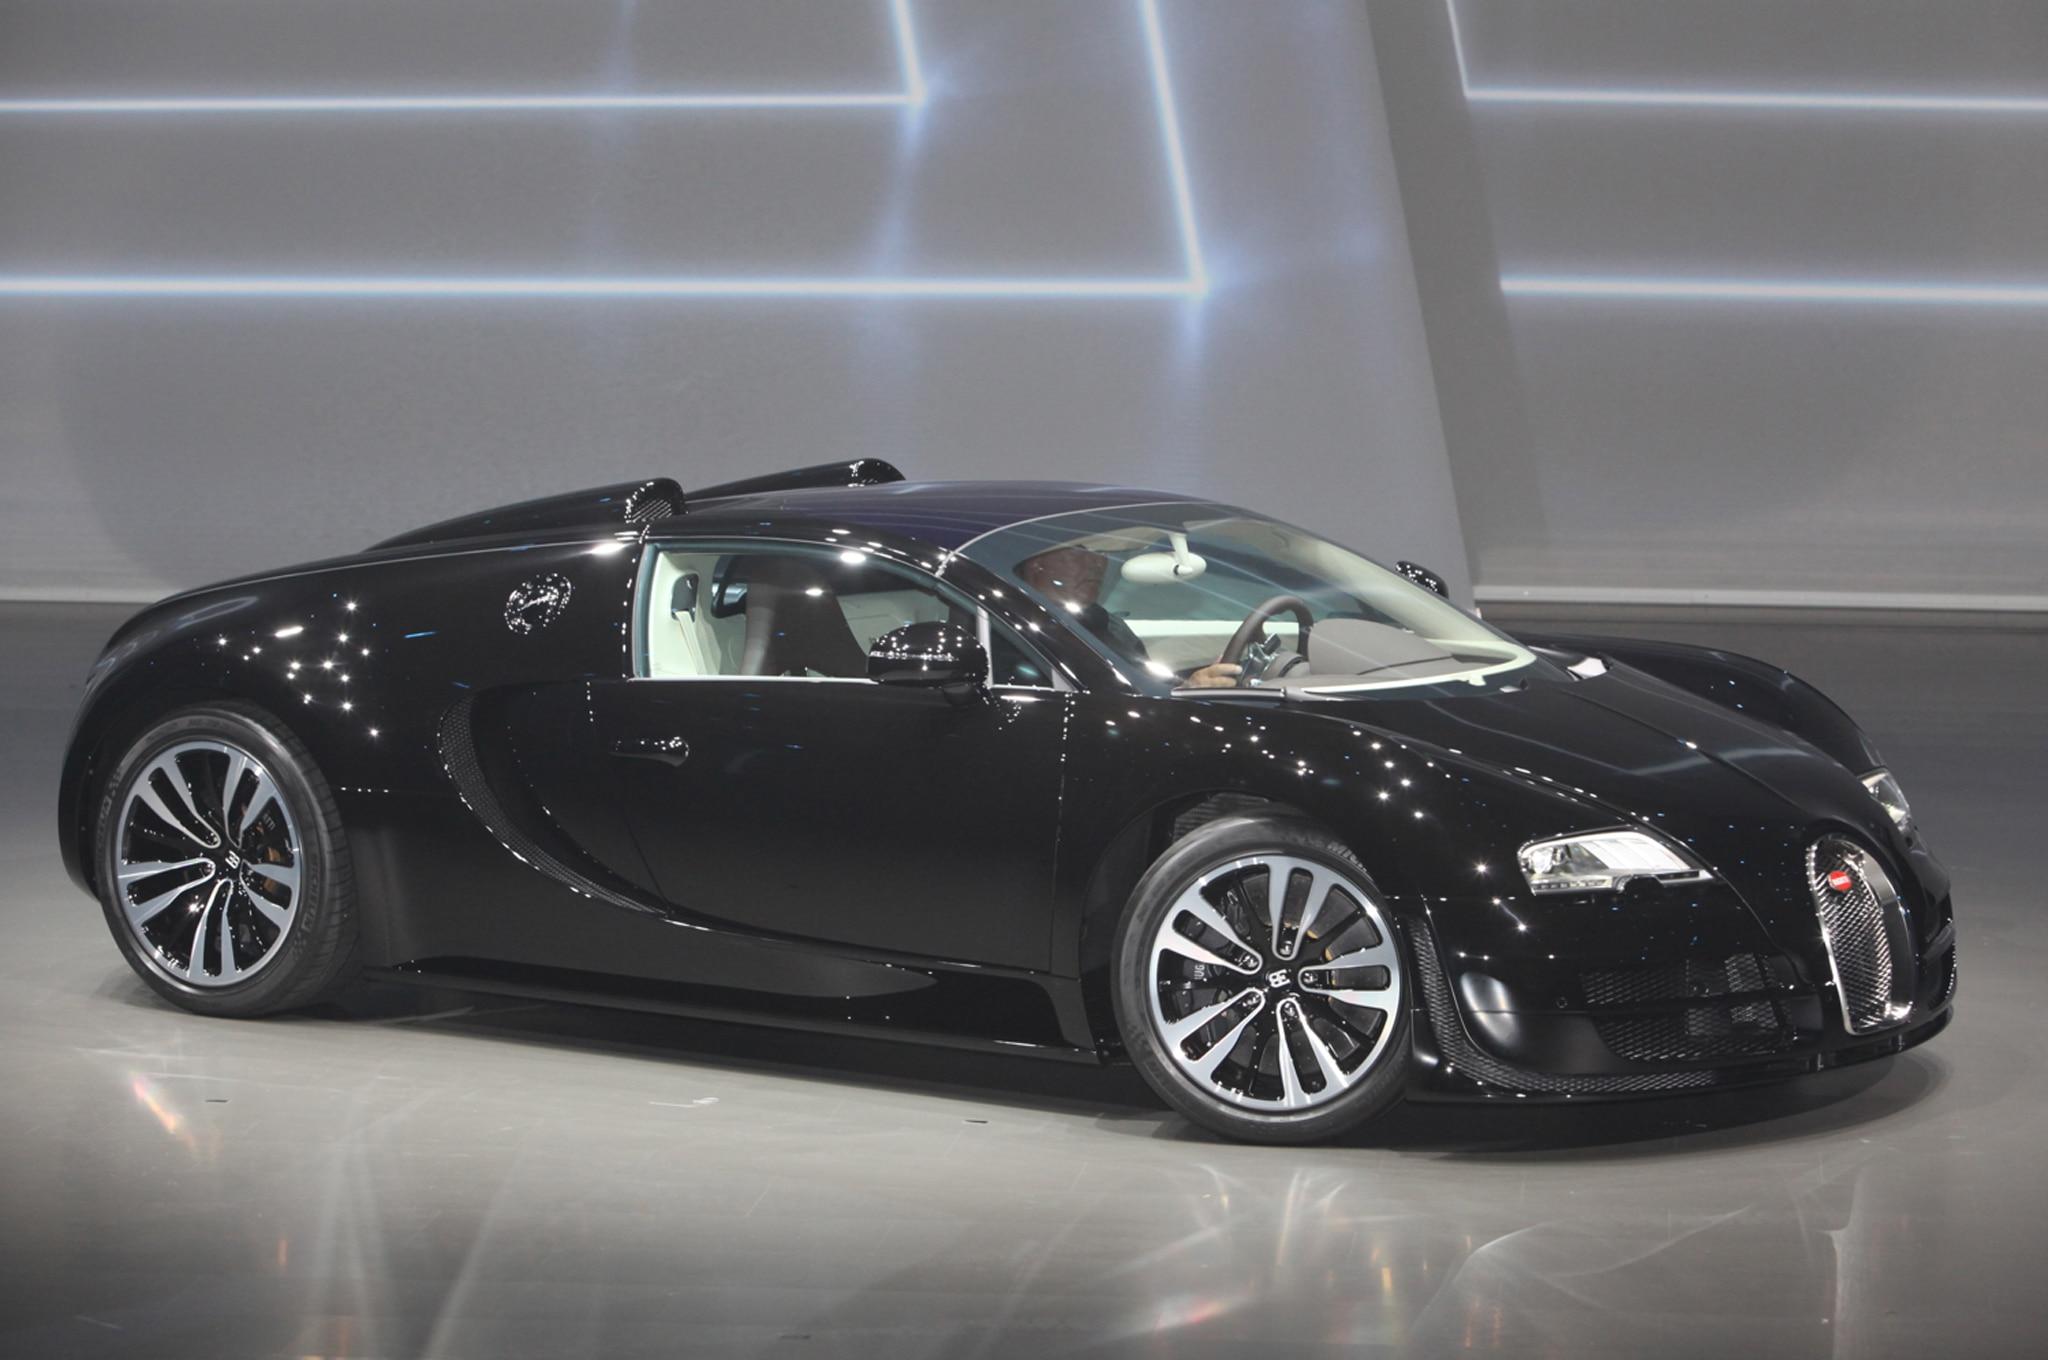 2013 Bugatti Veyron Jean Bugatti Legend Edition First Look ...